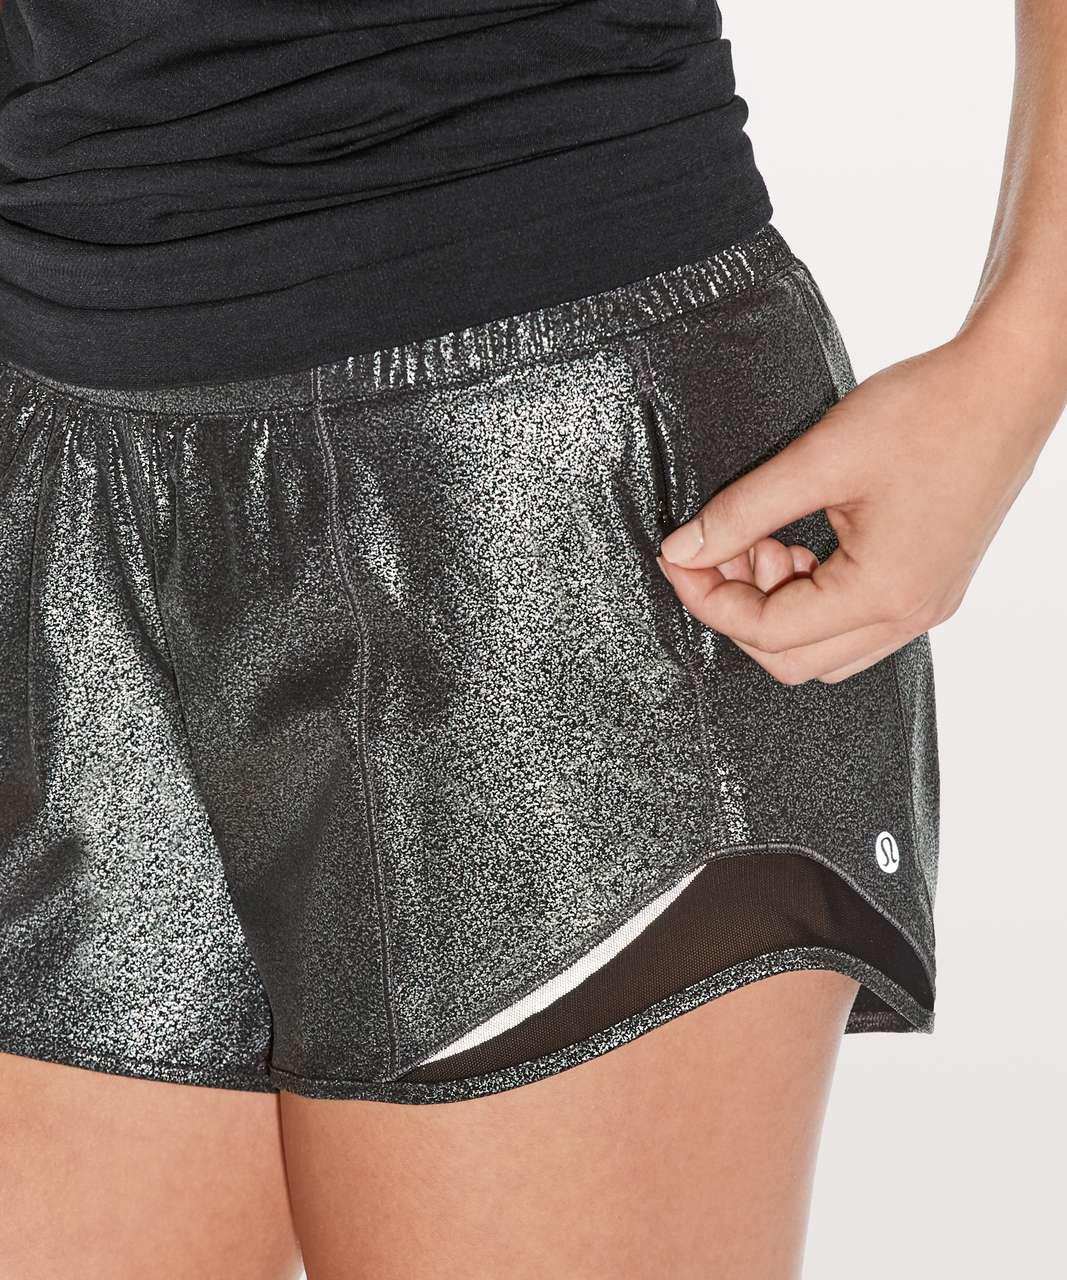 "Lululemon Hotty Hot Short II *Long 4"" - Luminosity Foil Print Black Silver / Black"